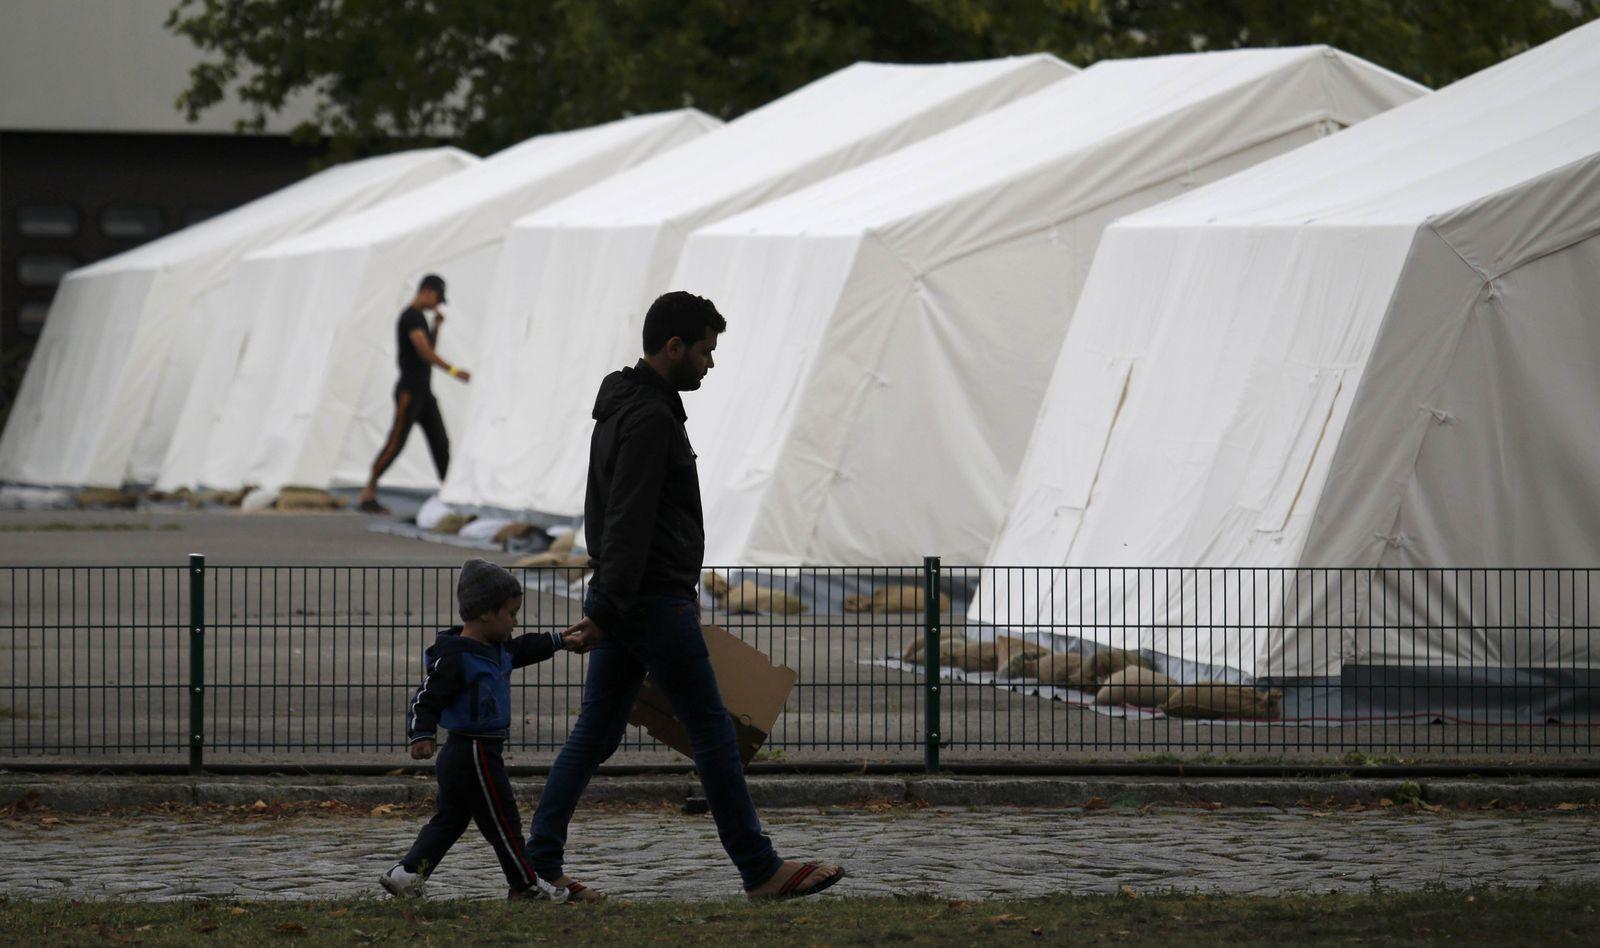 Deutschland/ Zelte/ Unterkunft/ Flüchtlinge